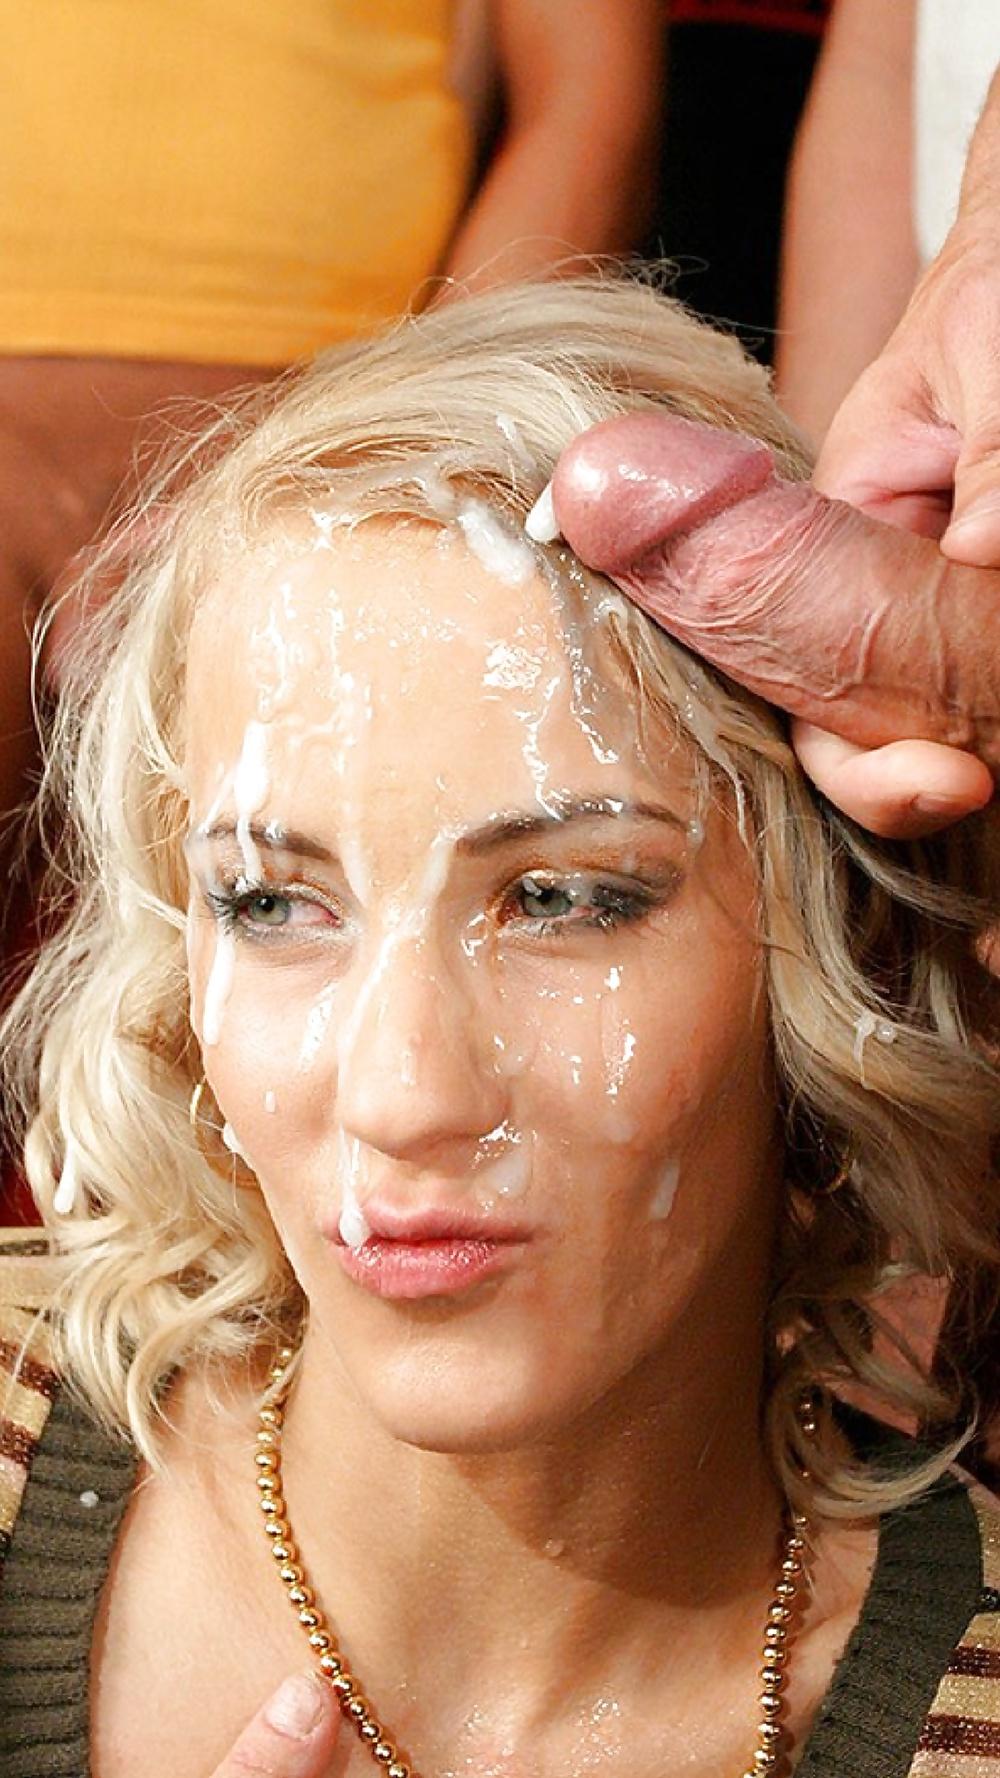 Онлайн брызги спермы на волосы сами